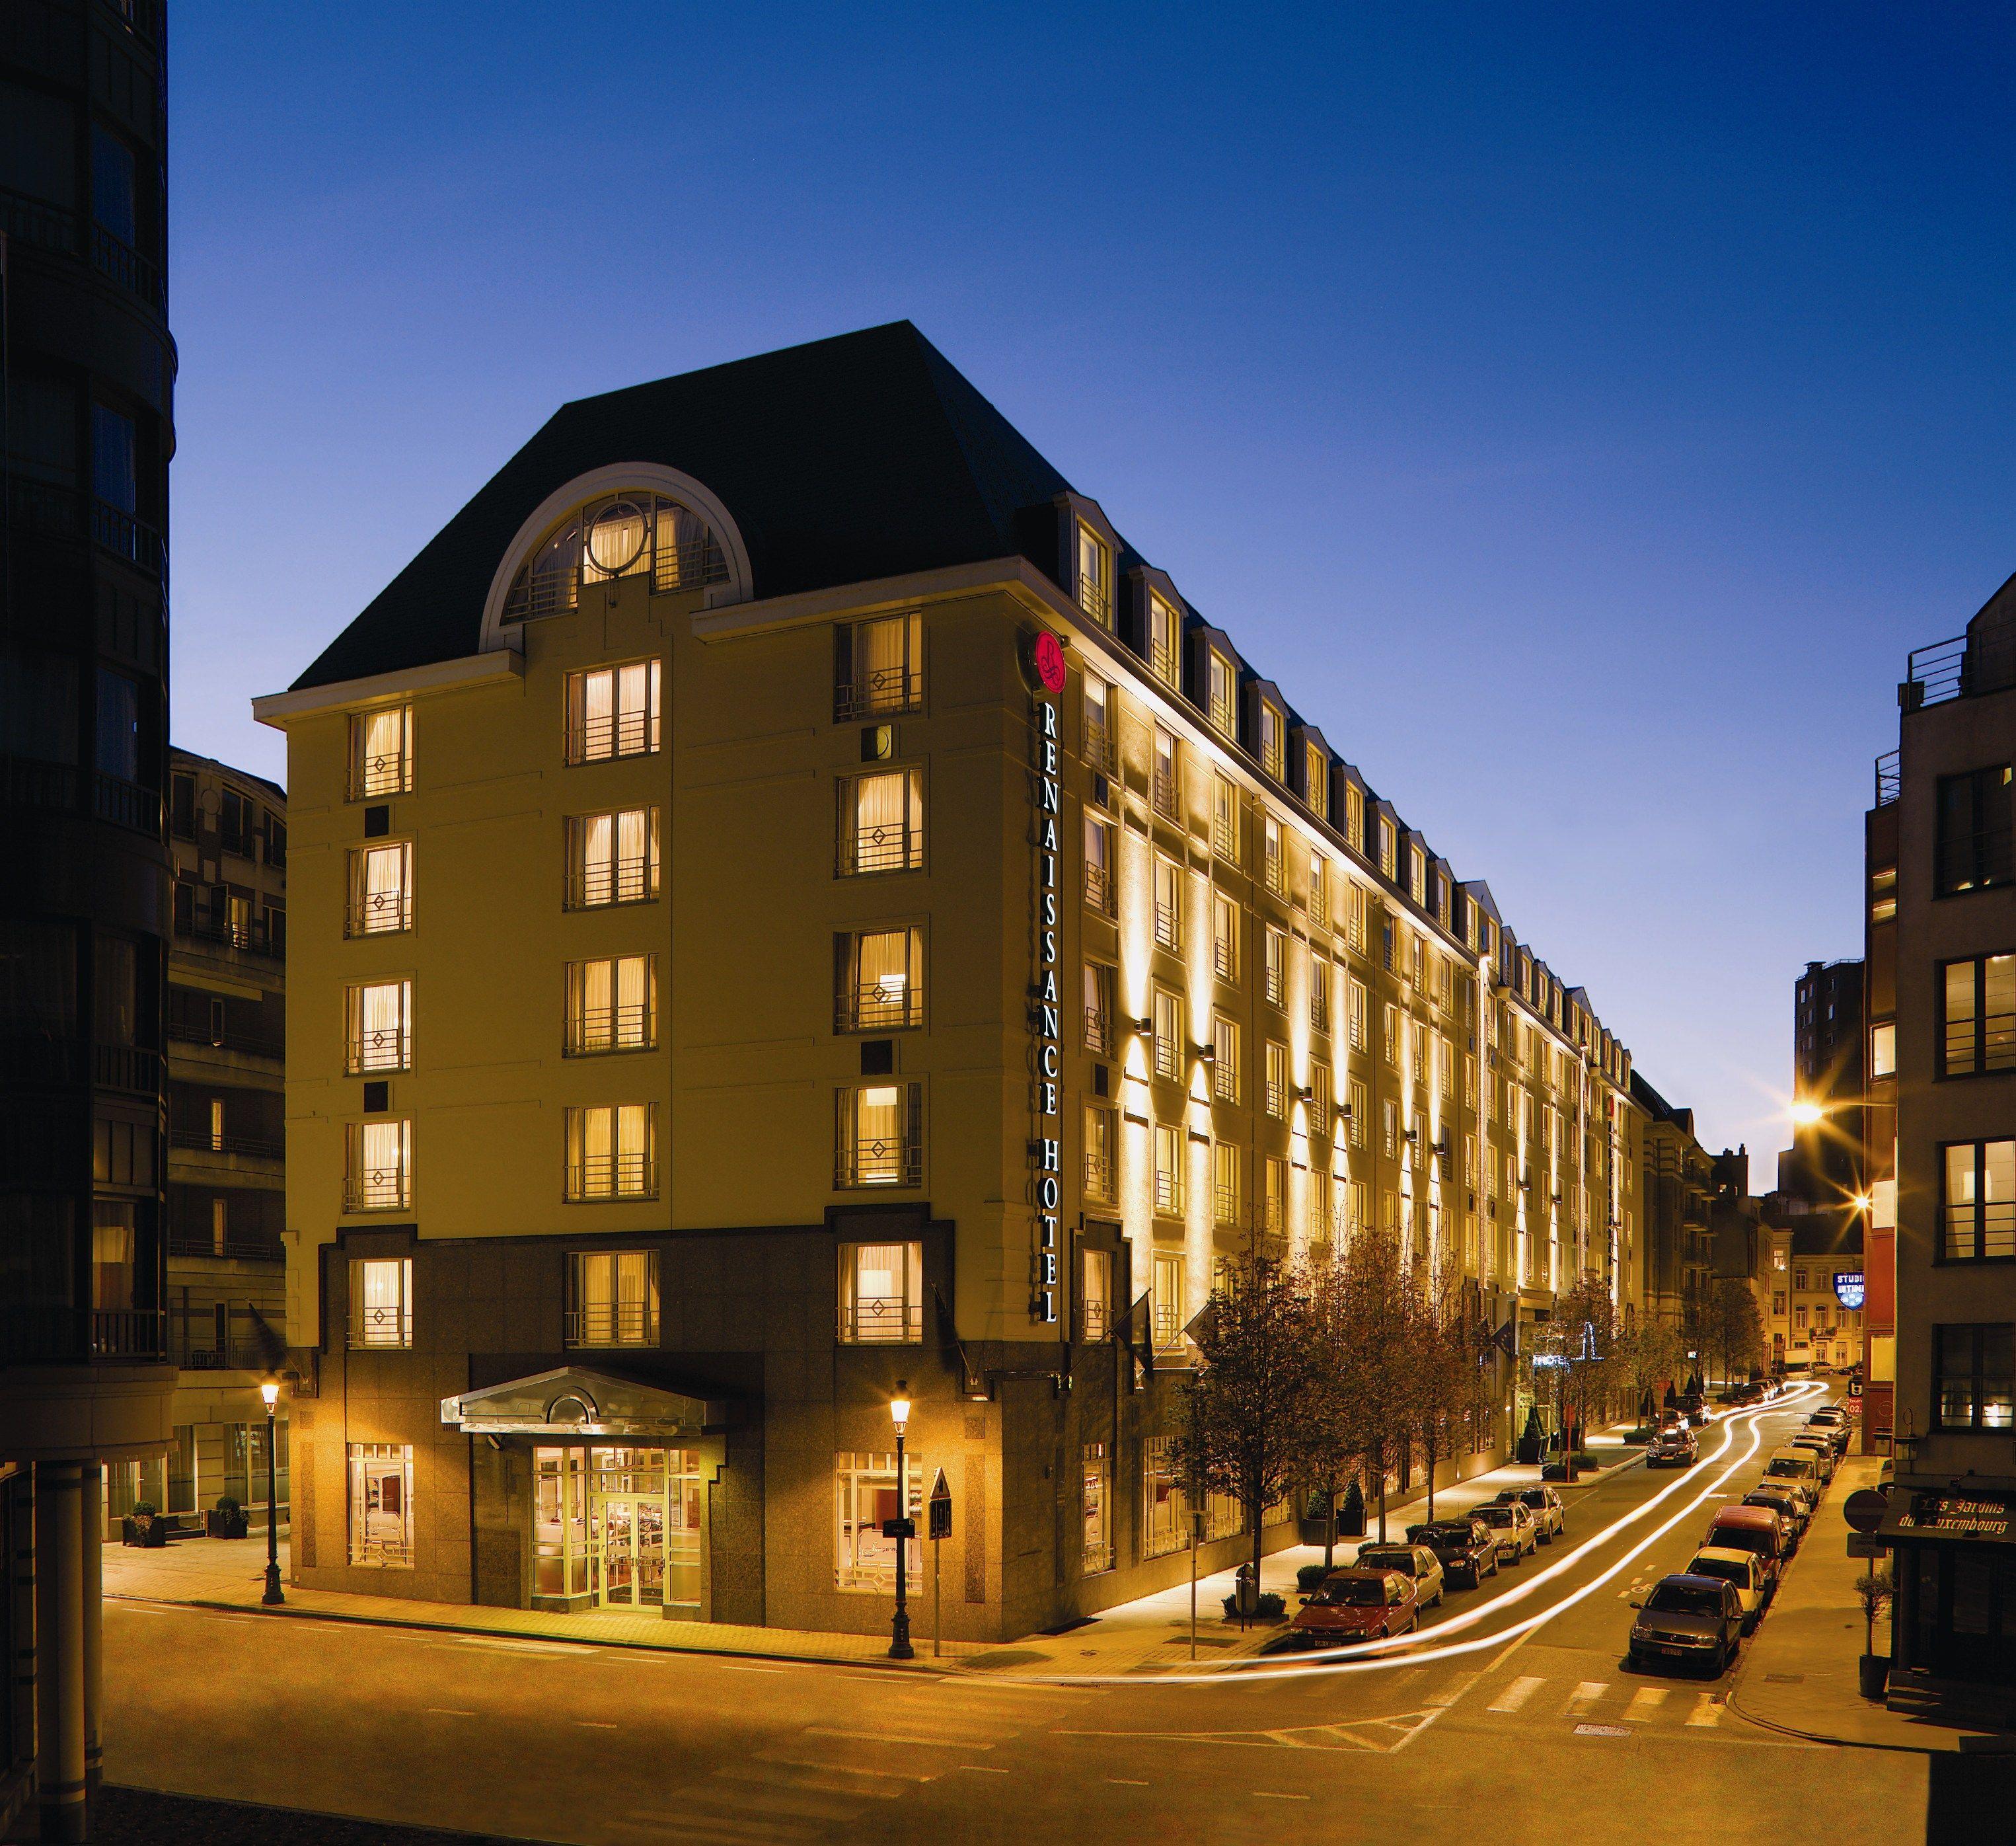 Renaissance Hotel Ixelles Brussels Belgium